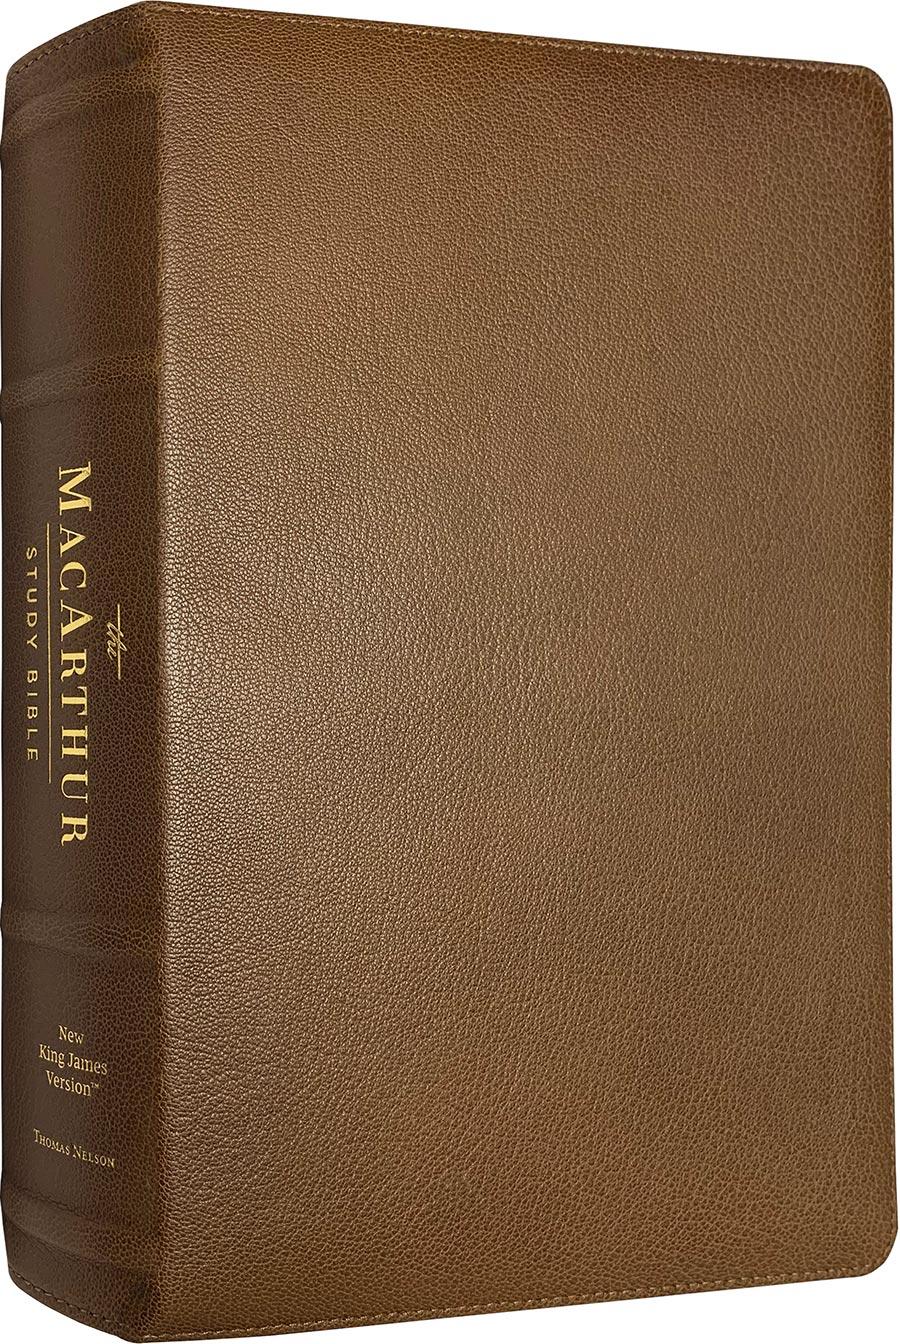 NKJV MacArthur Study Bible (Second Edition) (Brown Premium Leather)